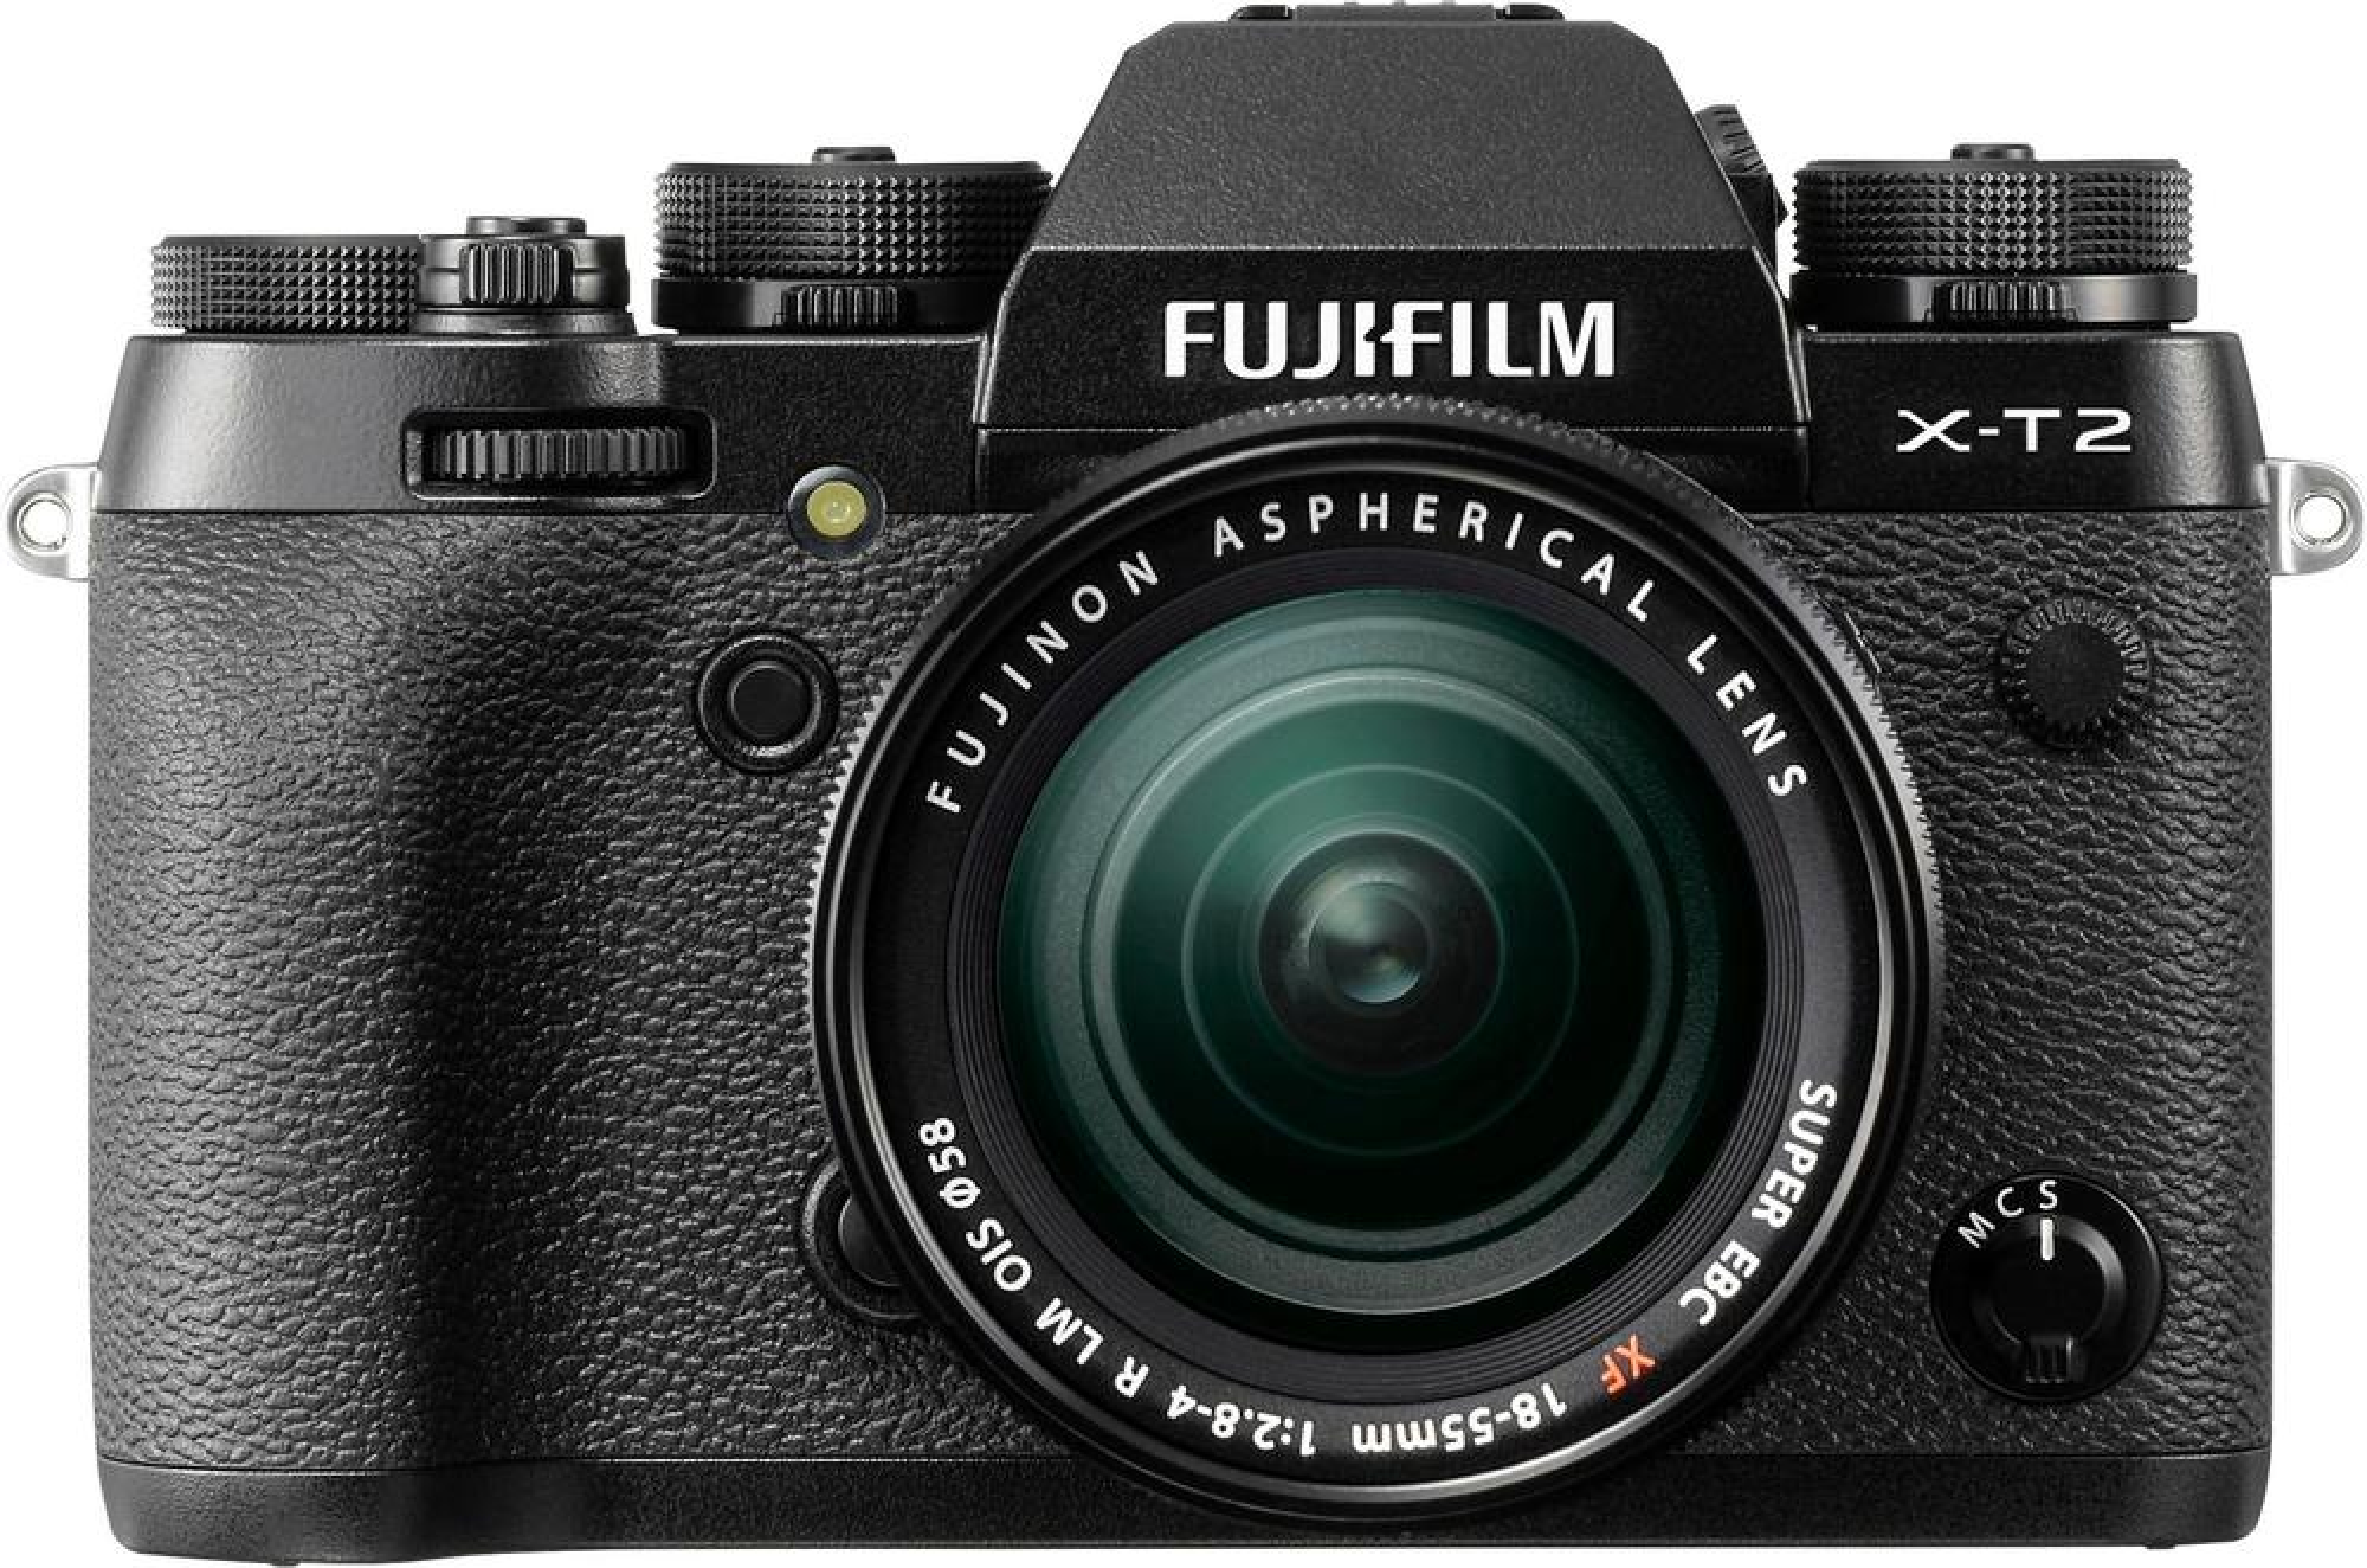 Fujifilm - X-T2 Mirrorless Camera with 18-55mm Lens - Black